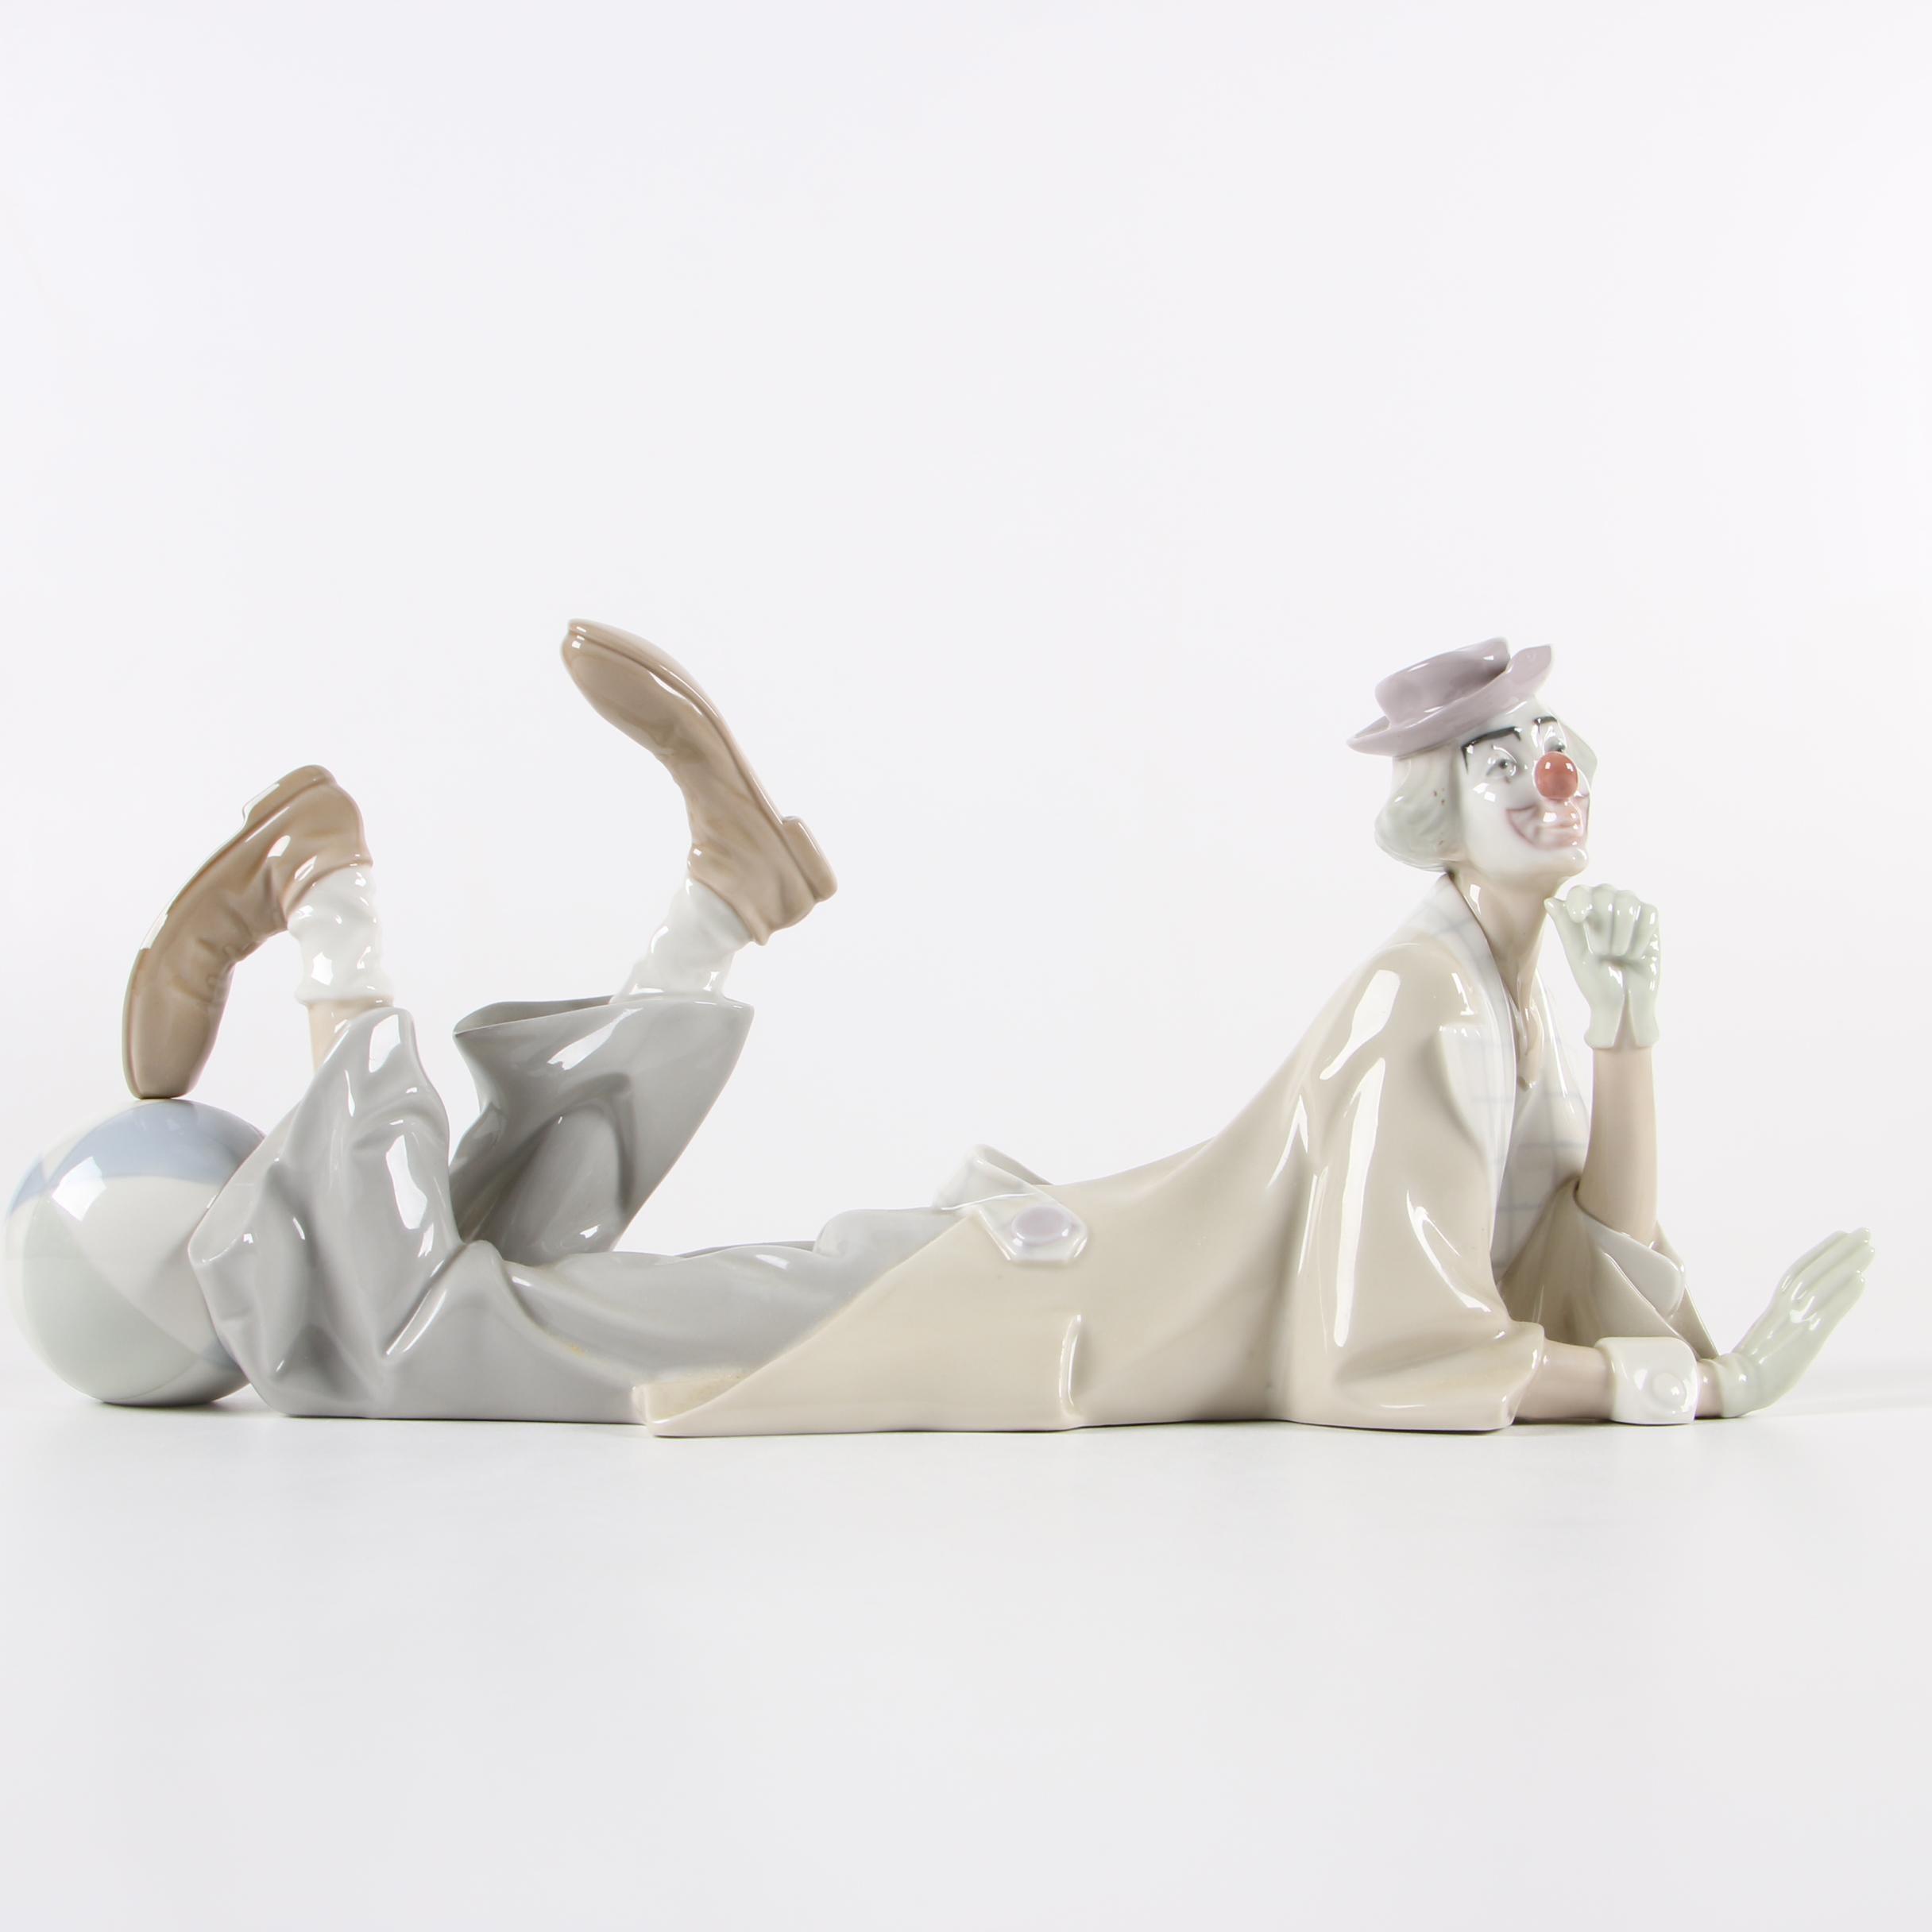 "Lladró ""Reclining Clown"" Porcelain Figurine"